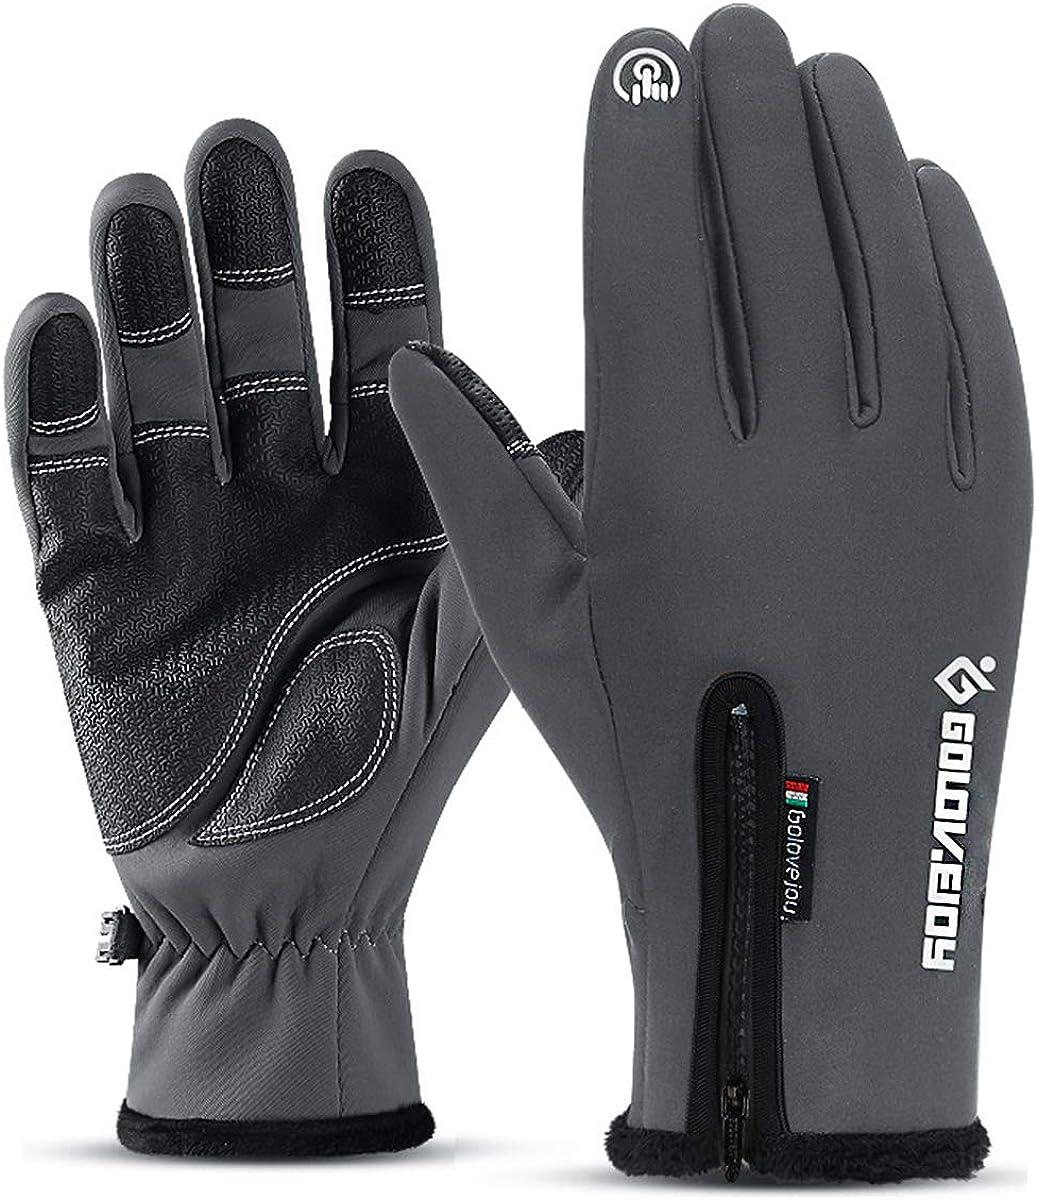 Golovejoy Winter Gloves Waterproof Windproof Anti-slip Gloves All Finger Touch Screen Men